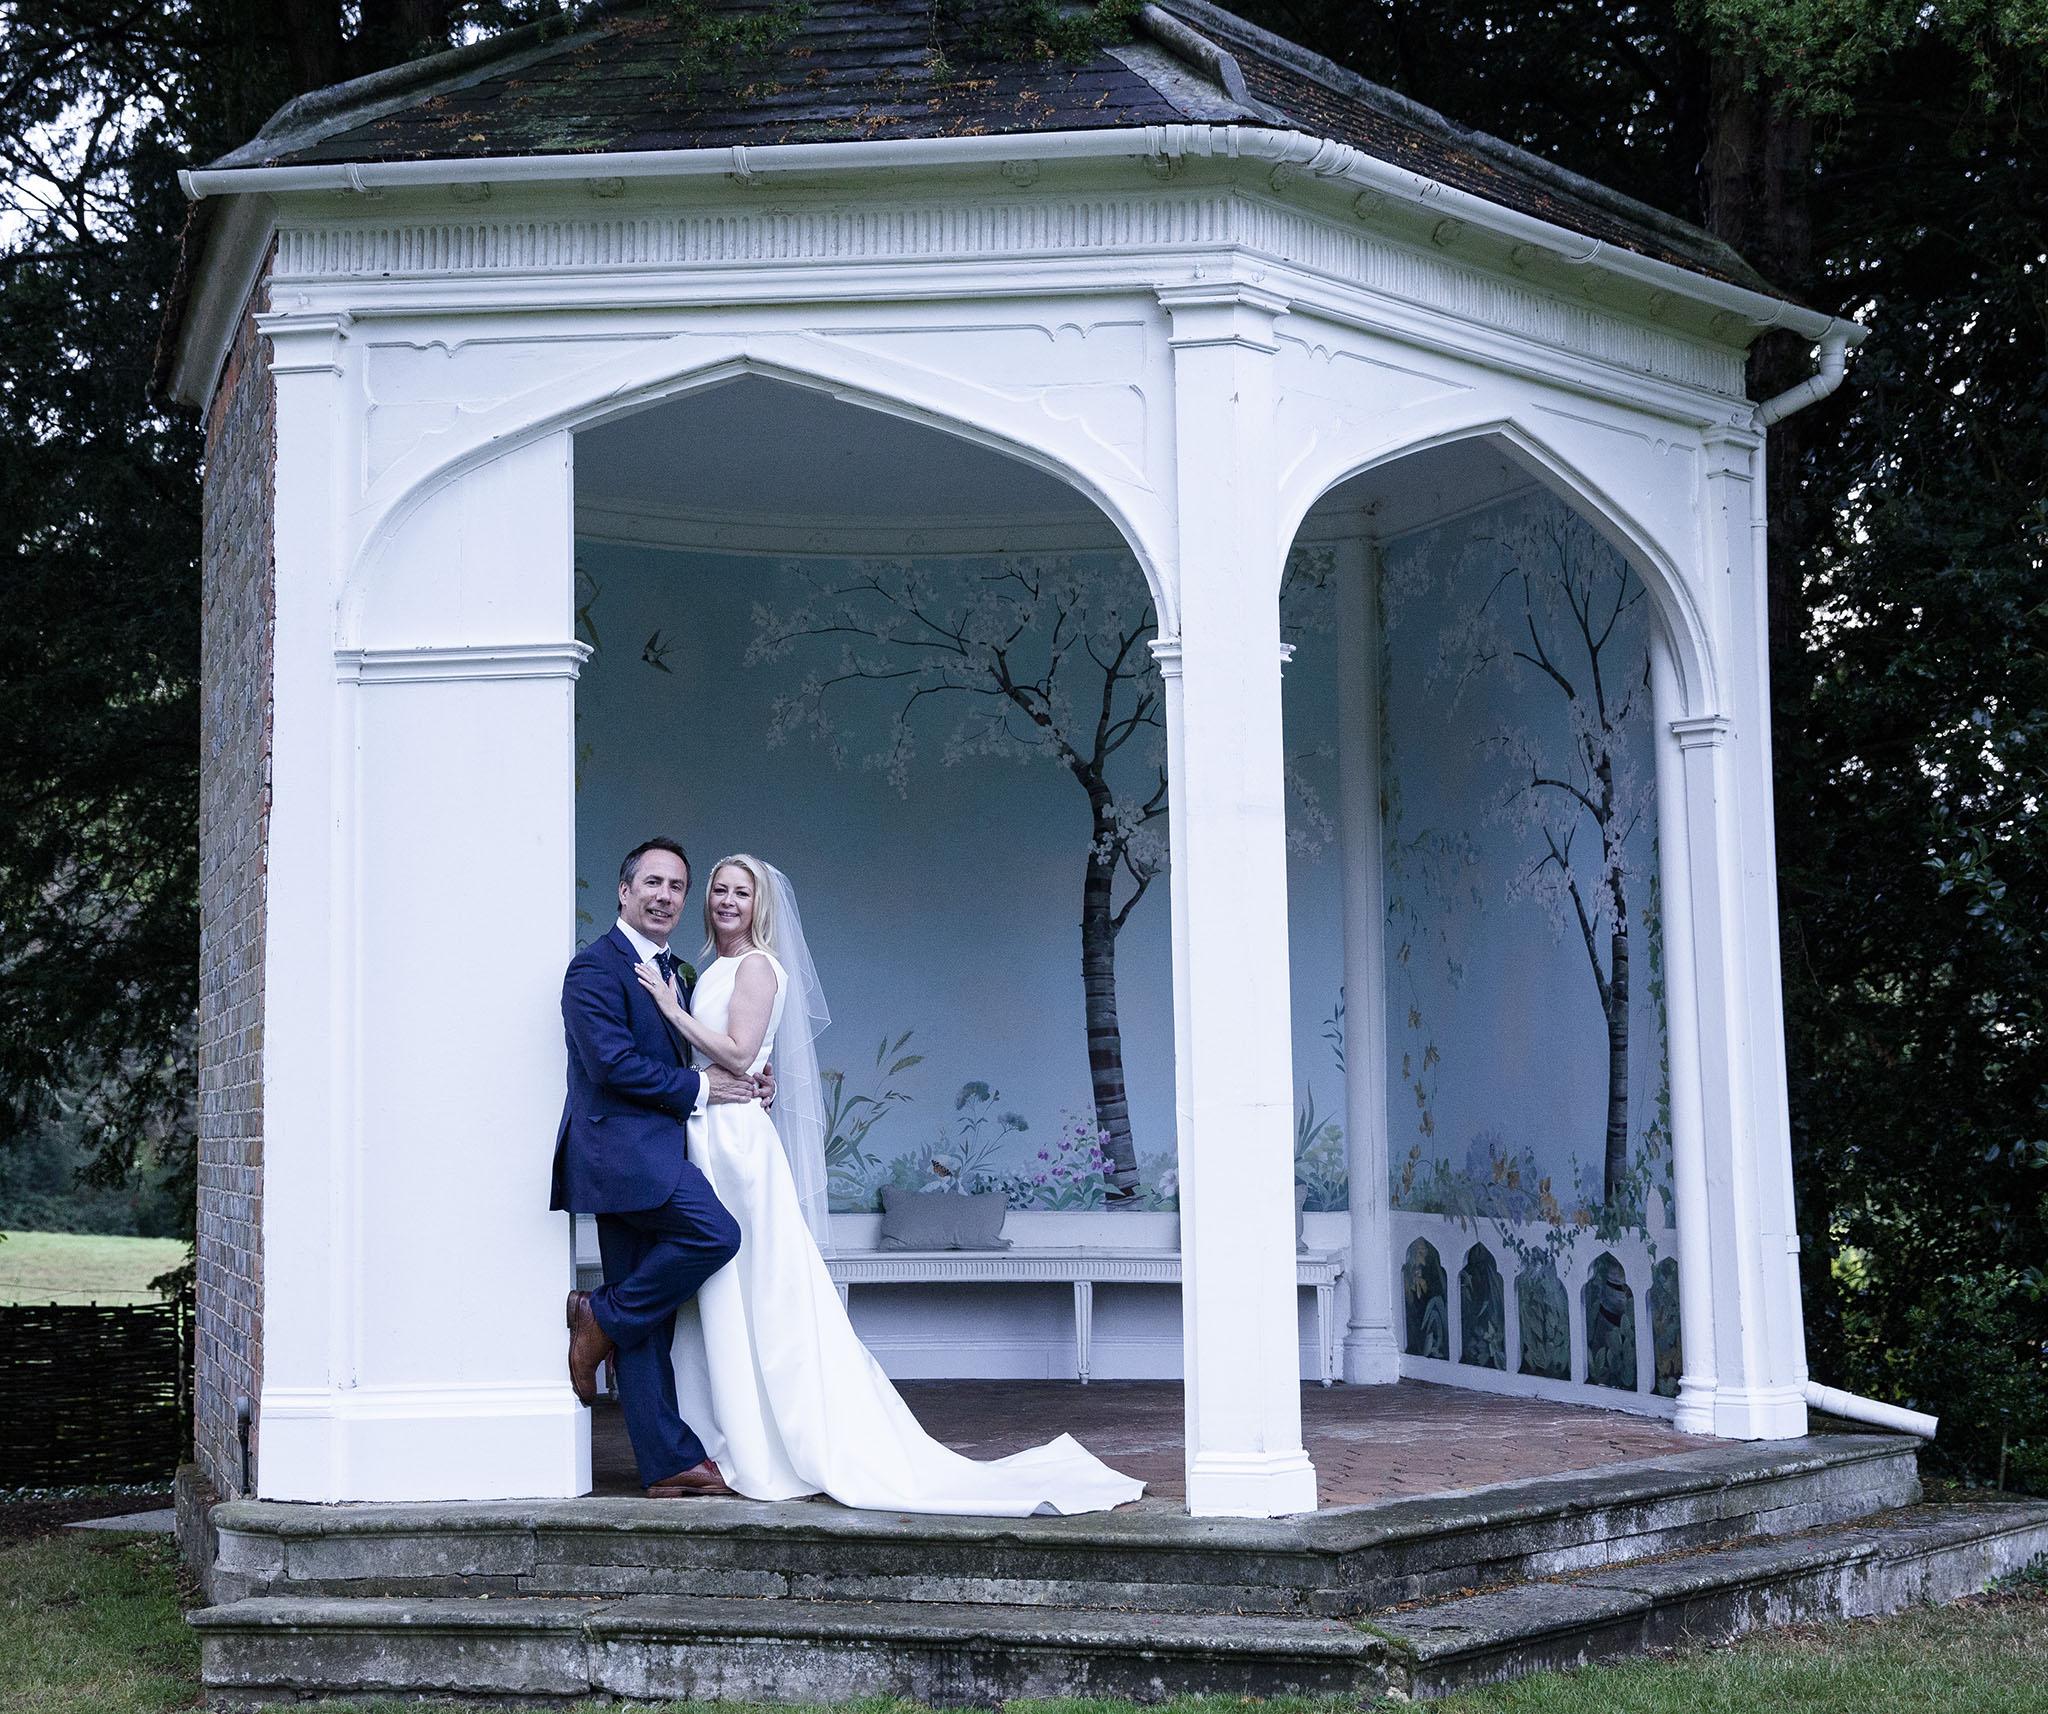 elizabethg_photography_hertfordshire_fineart_photographer_tonycharlie_wedding_photography_aldermaston_wasing_park_reading_35.jpg